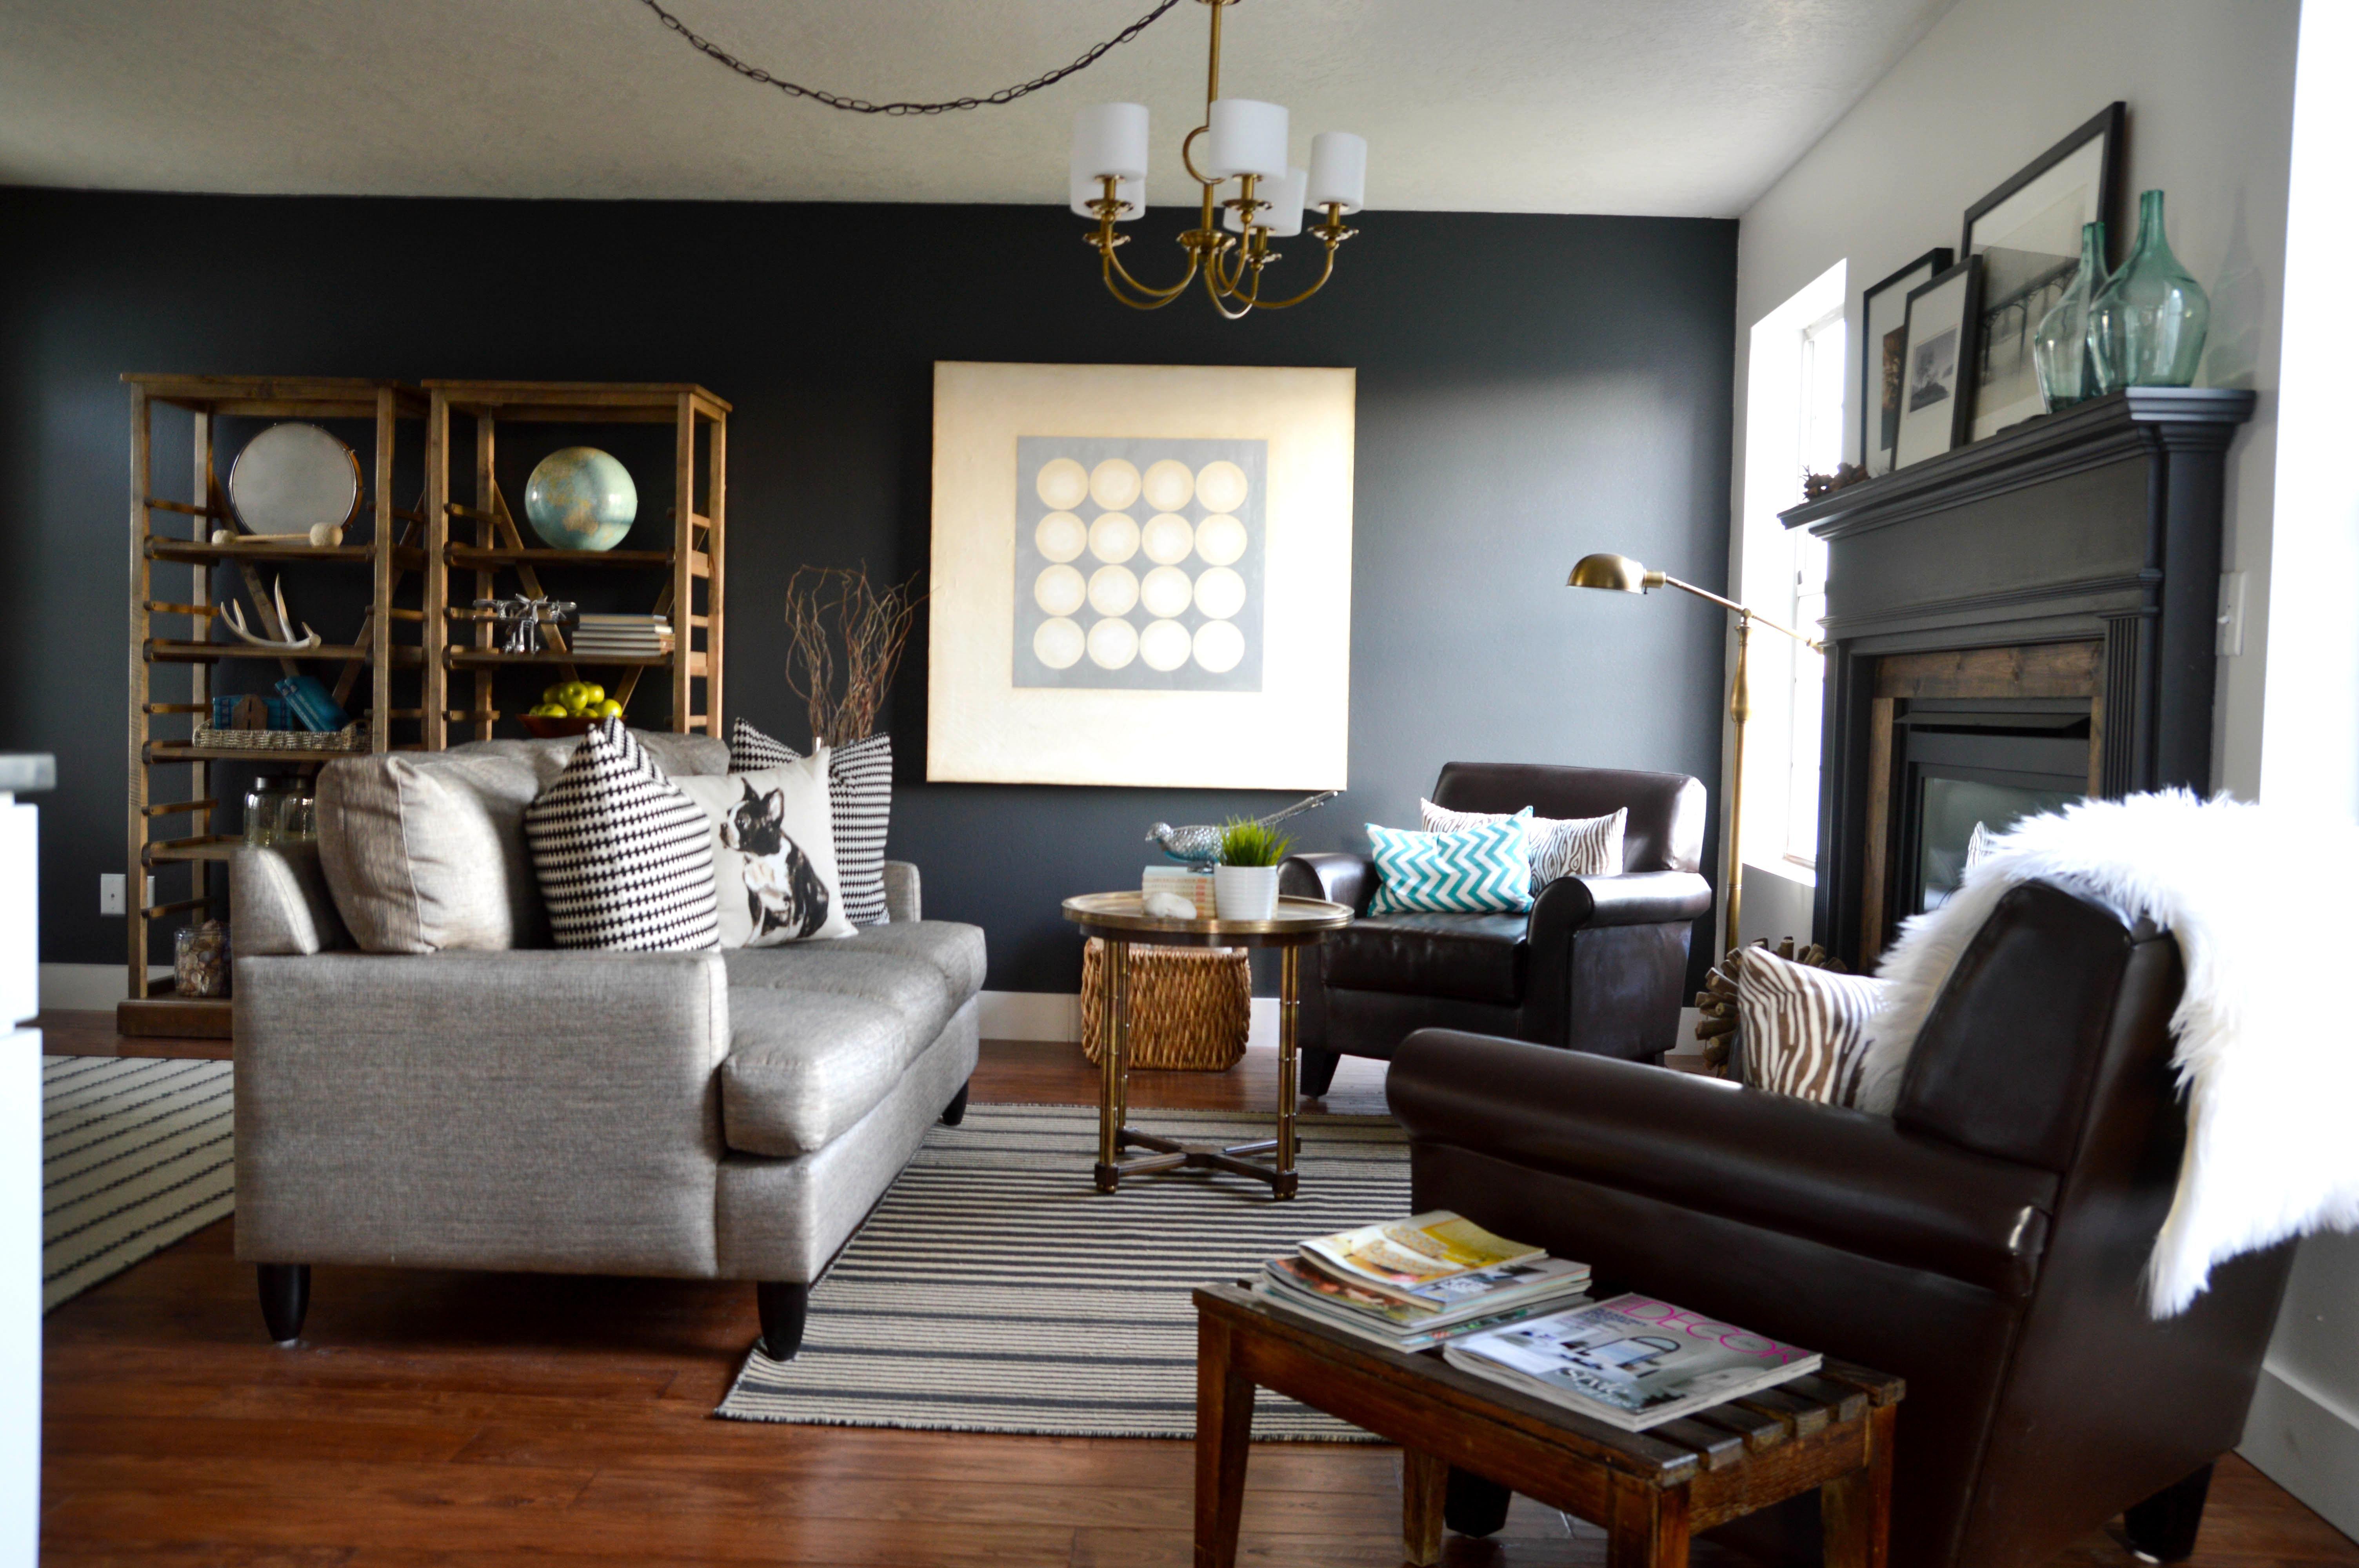 Livingroom Warm Grey Paint Colors For Living Room Best Light Color Schemes Sofas In Dark Grey Liv Living Room Renovation Living Room Warm Trendy Living Rooms #new #living #room #paint #colors